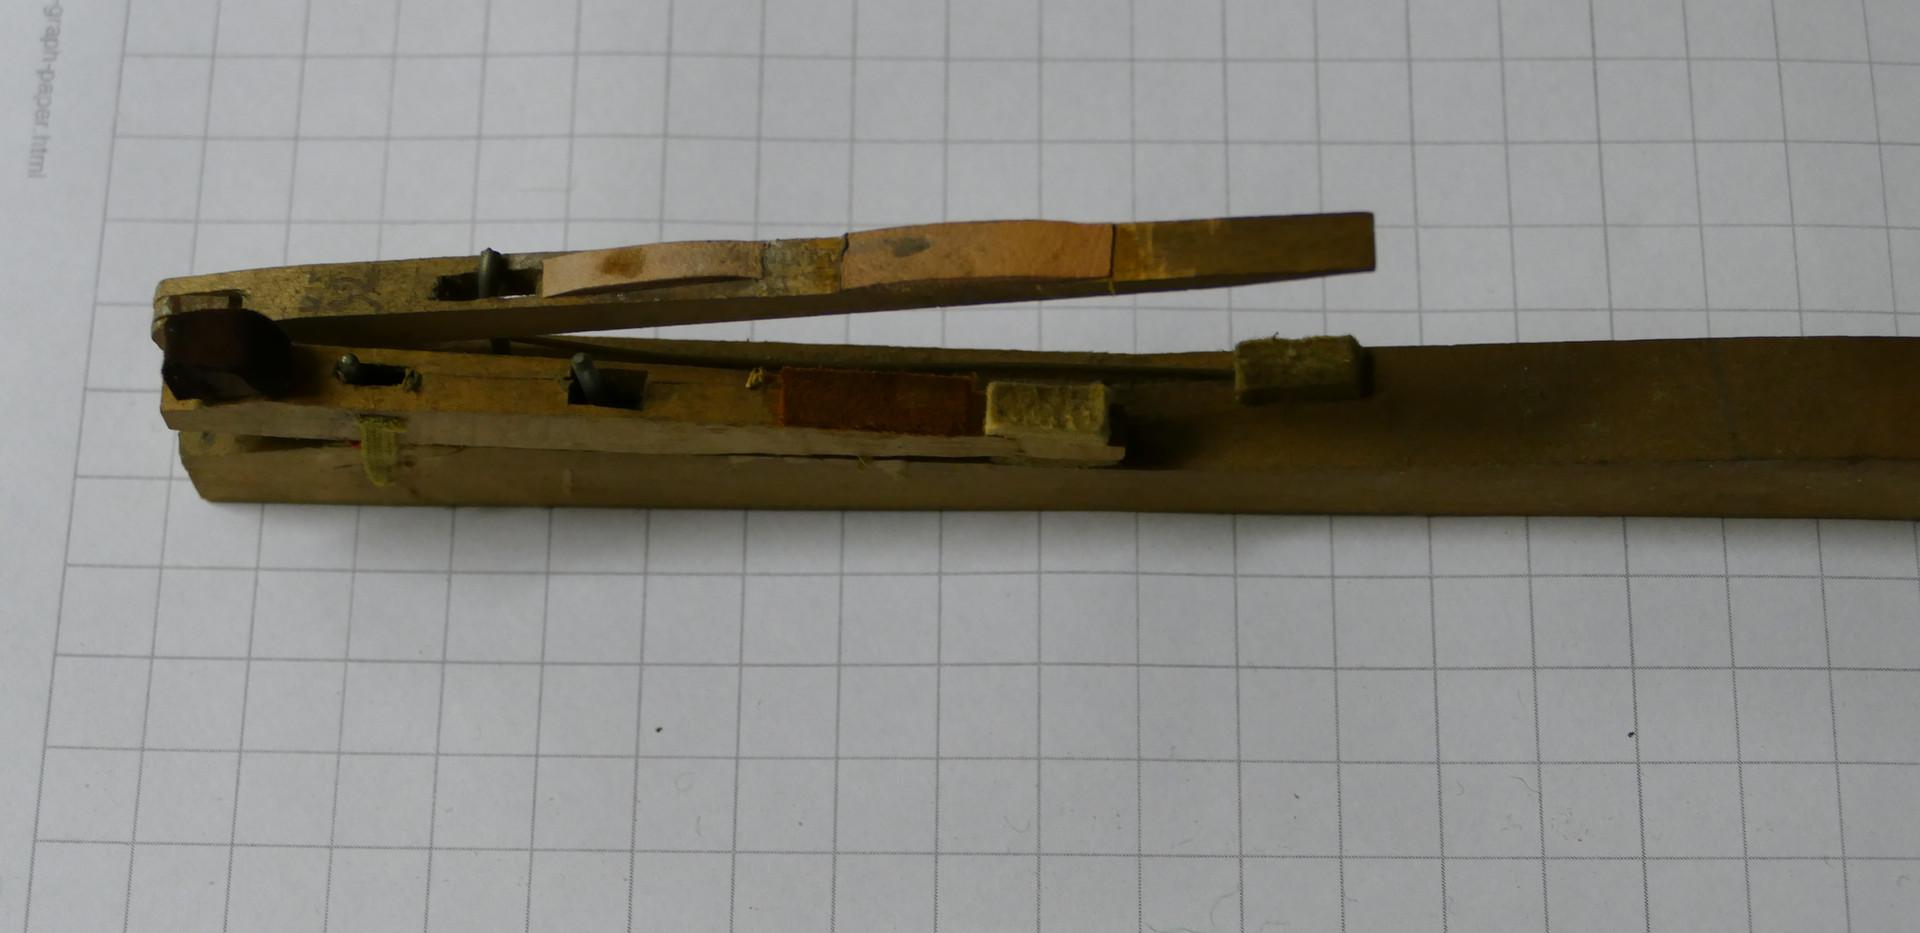 Tangentenflügel Mechanik.JPG